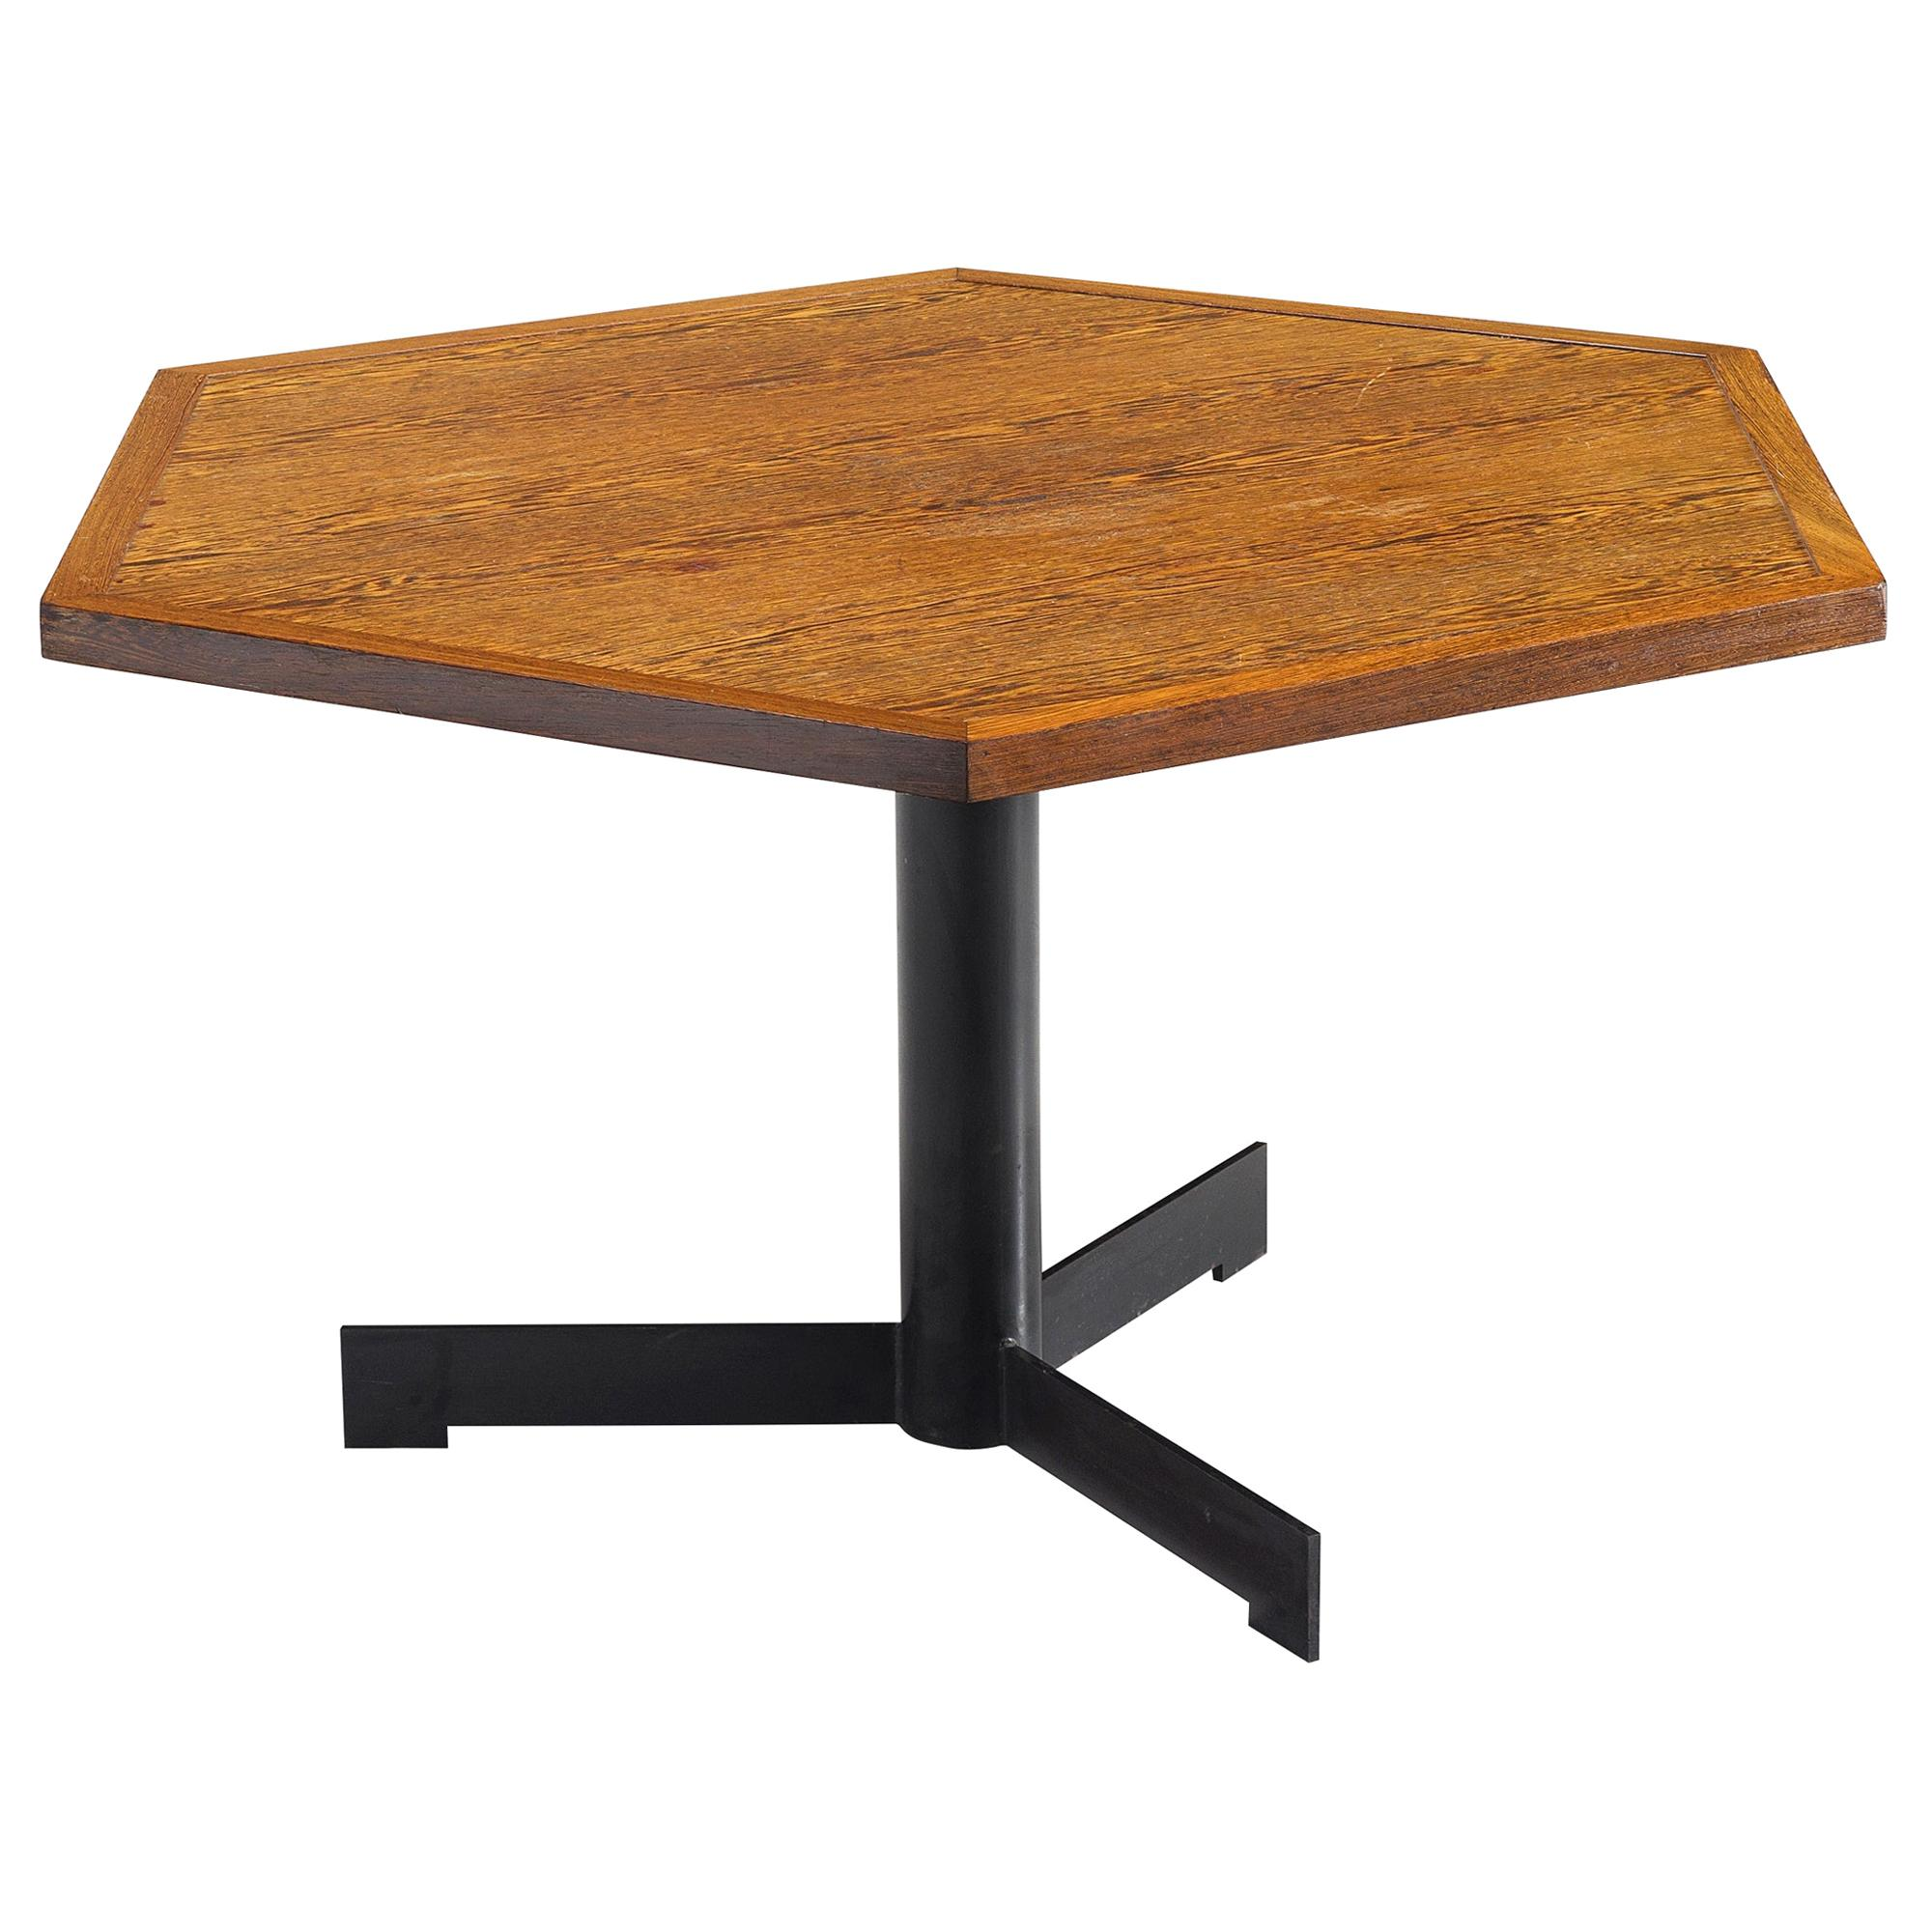 Hexagonal Pedestal Table in Wenge